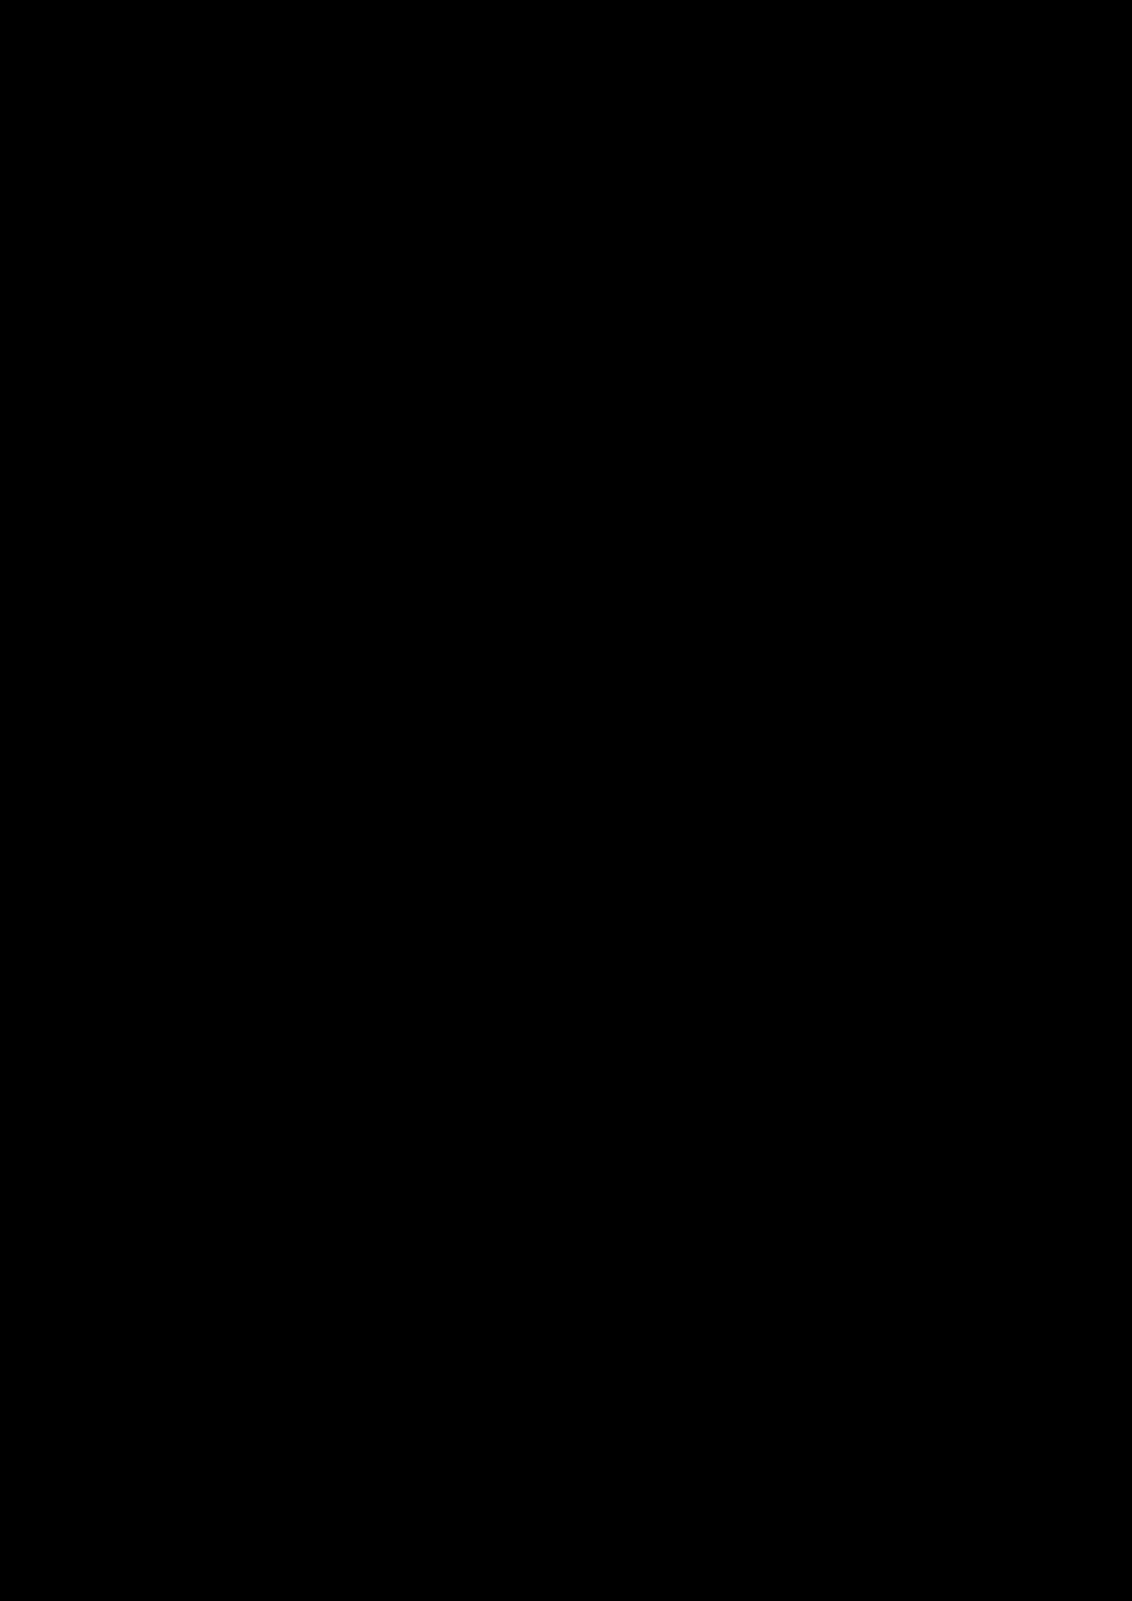 Okean Pustotyi slide, Image 45